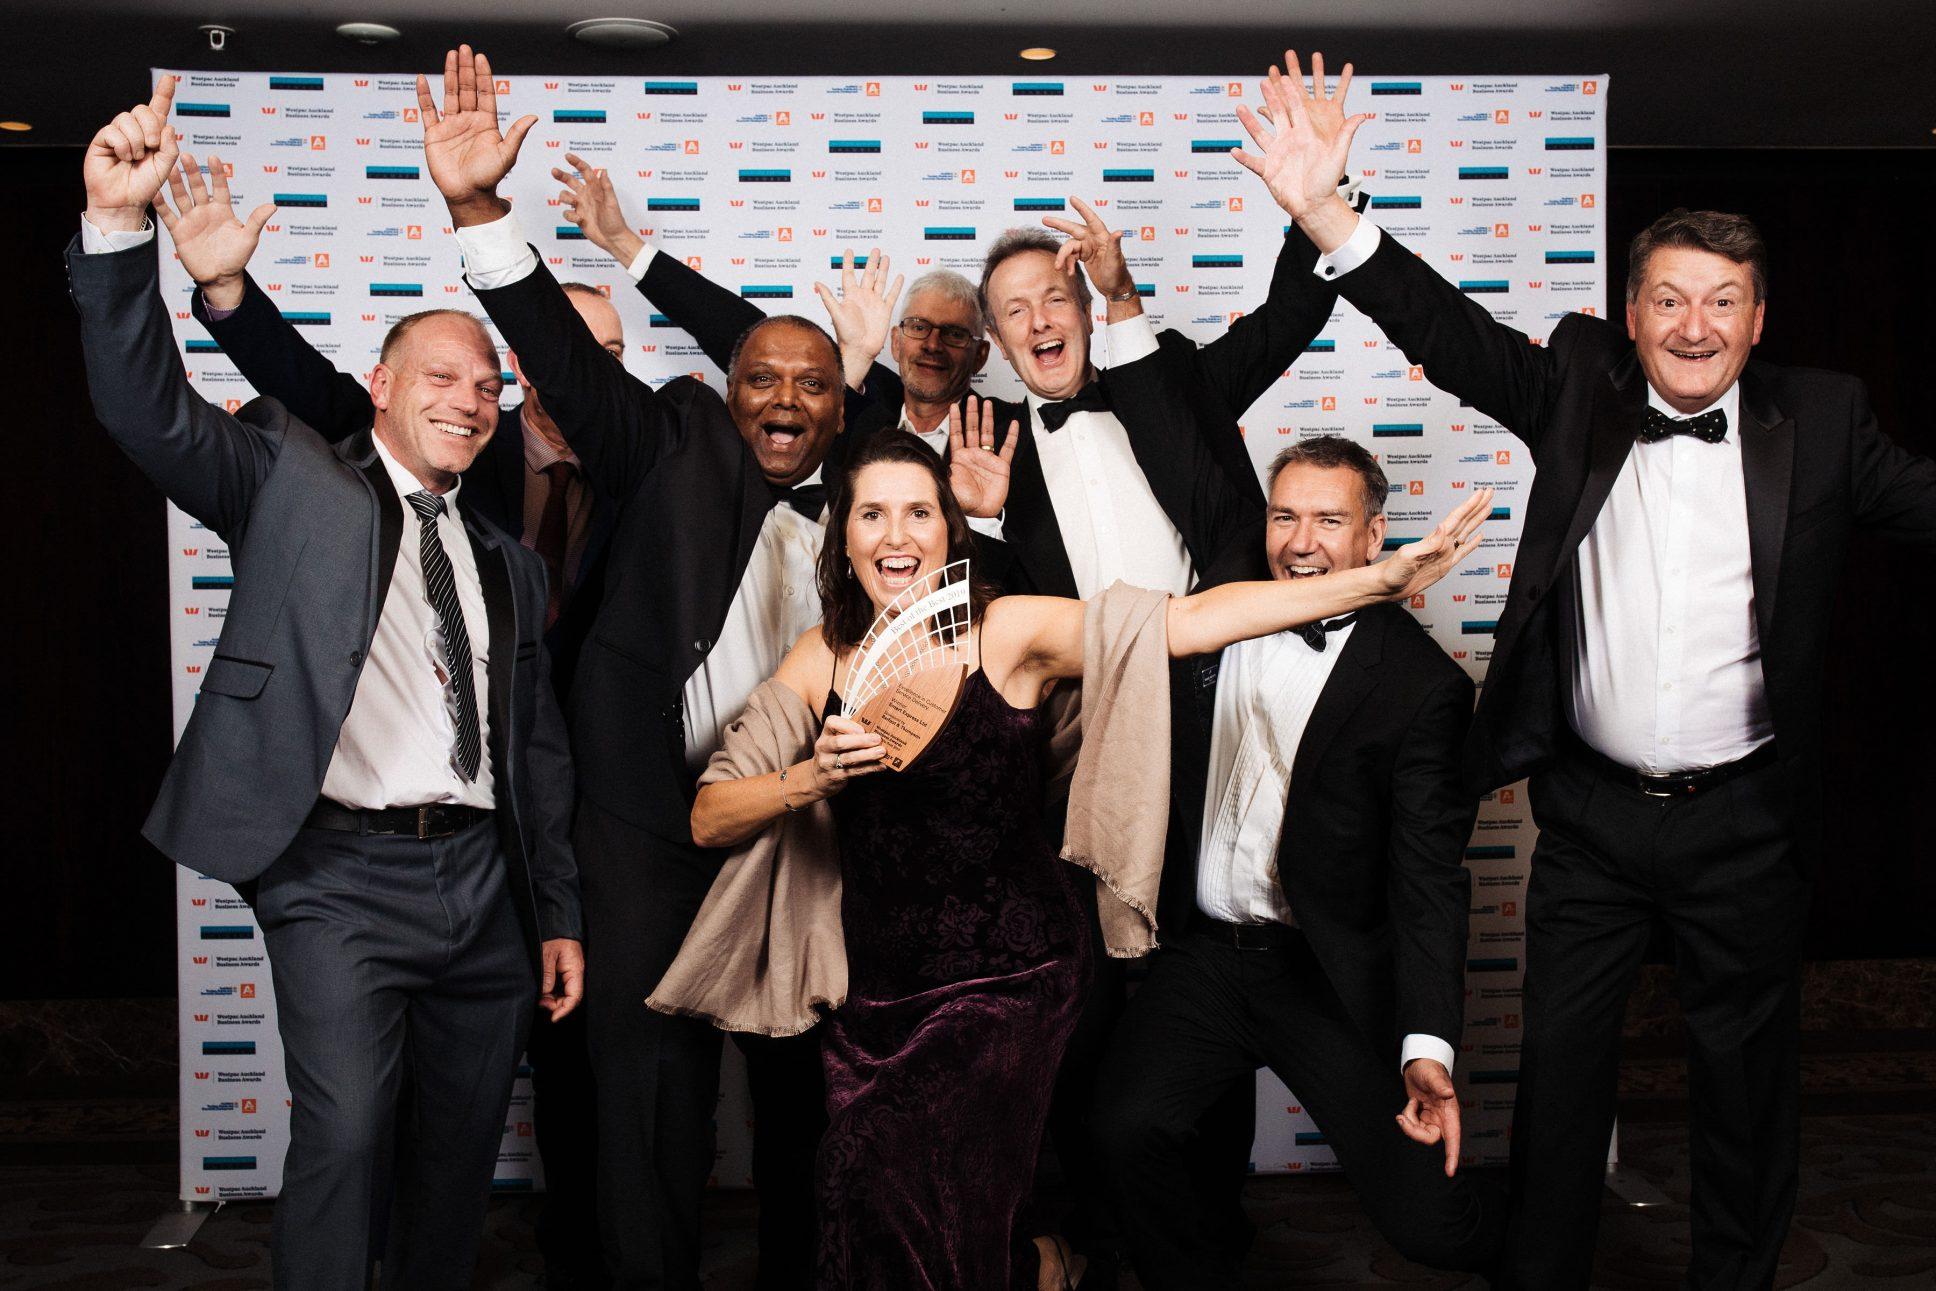 Westpac business awards at cordis Auckland